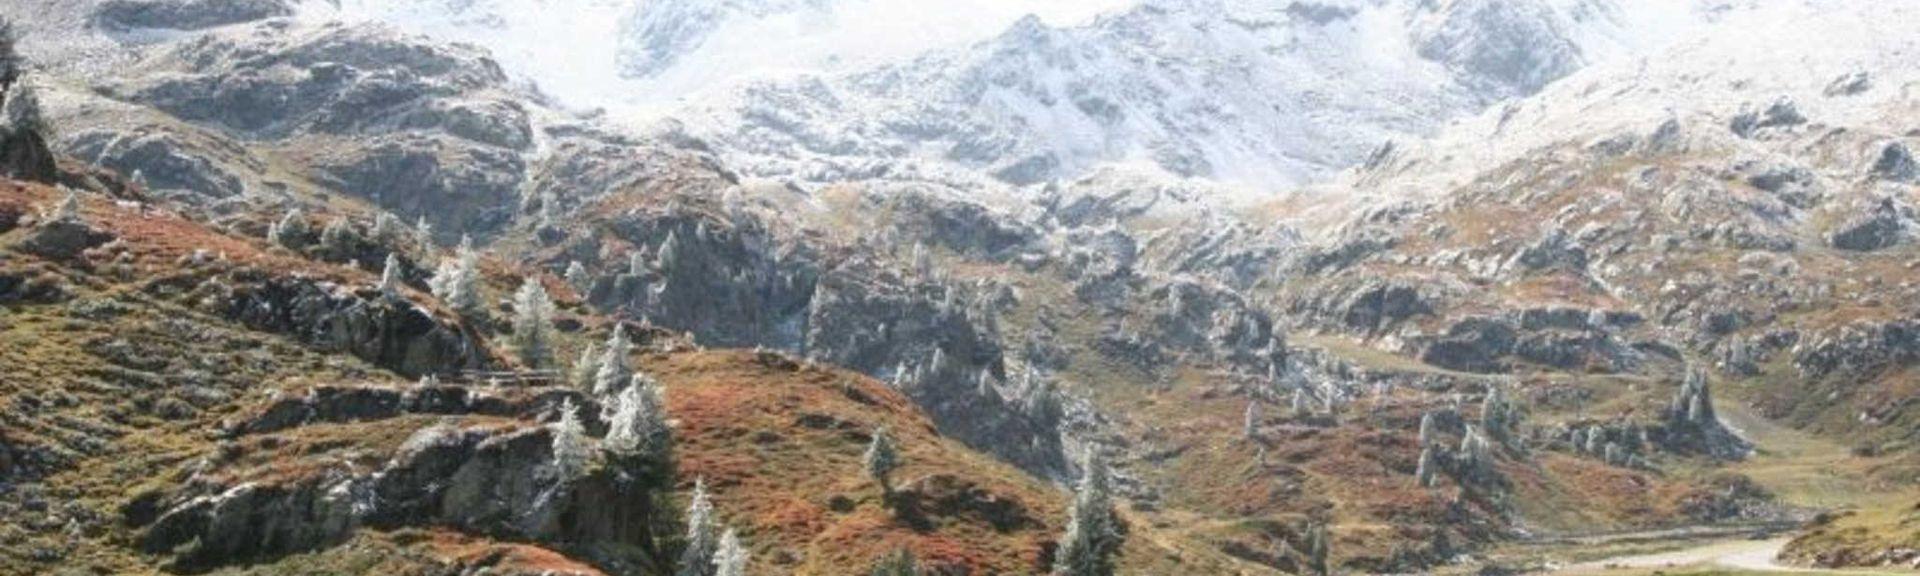 Distretto di Landeck, Tirolo, Austria